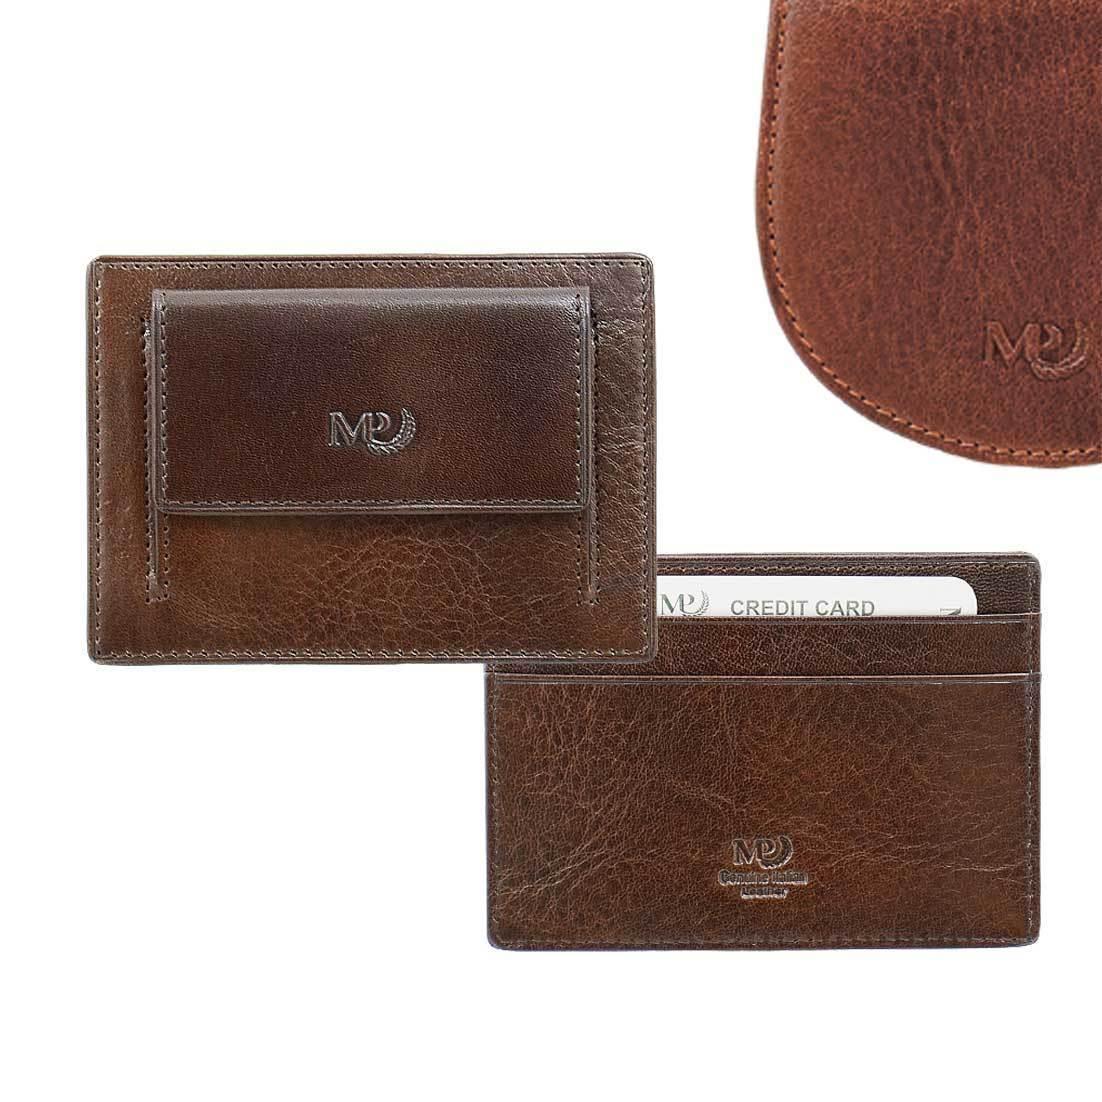 B120256R Cognac - Футляр для карт MP с RFID защитой